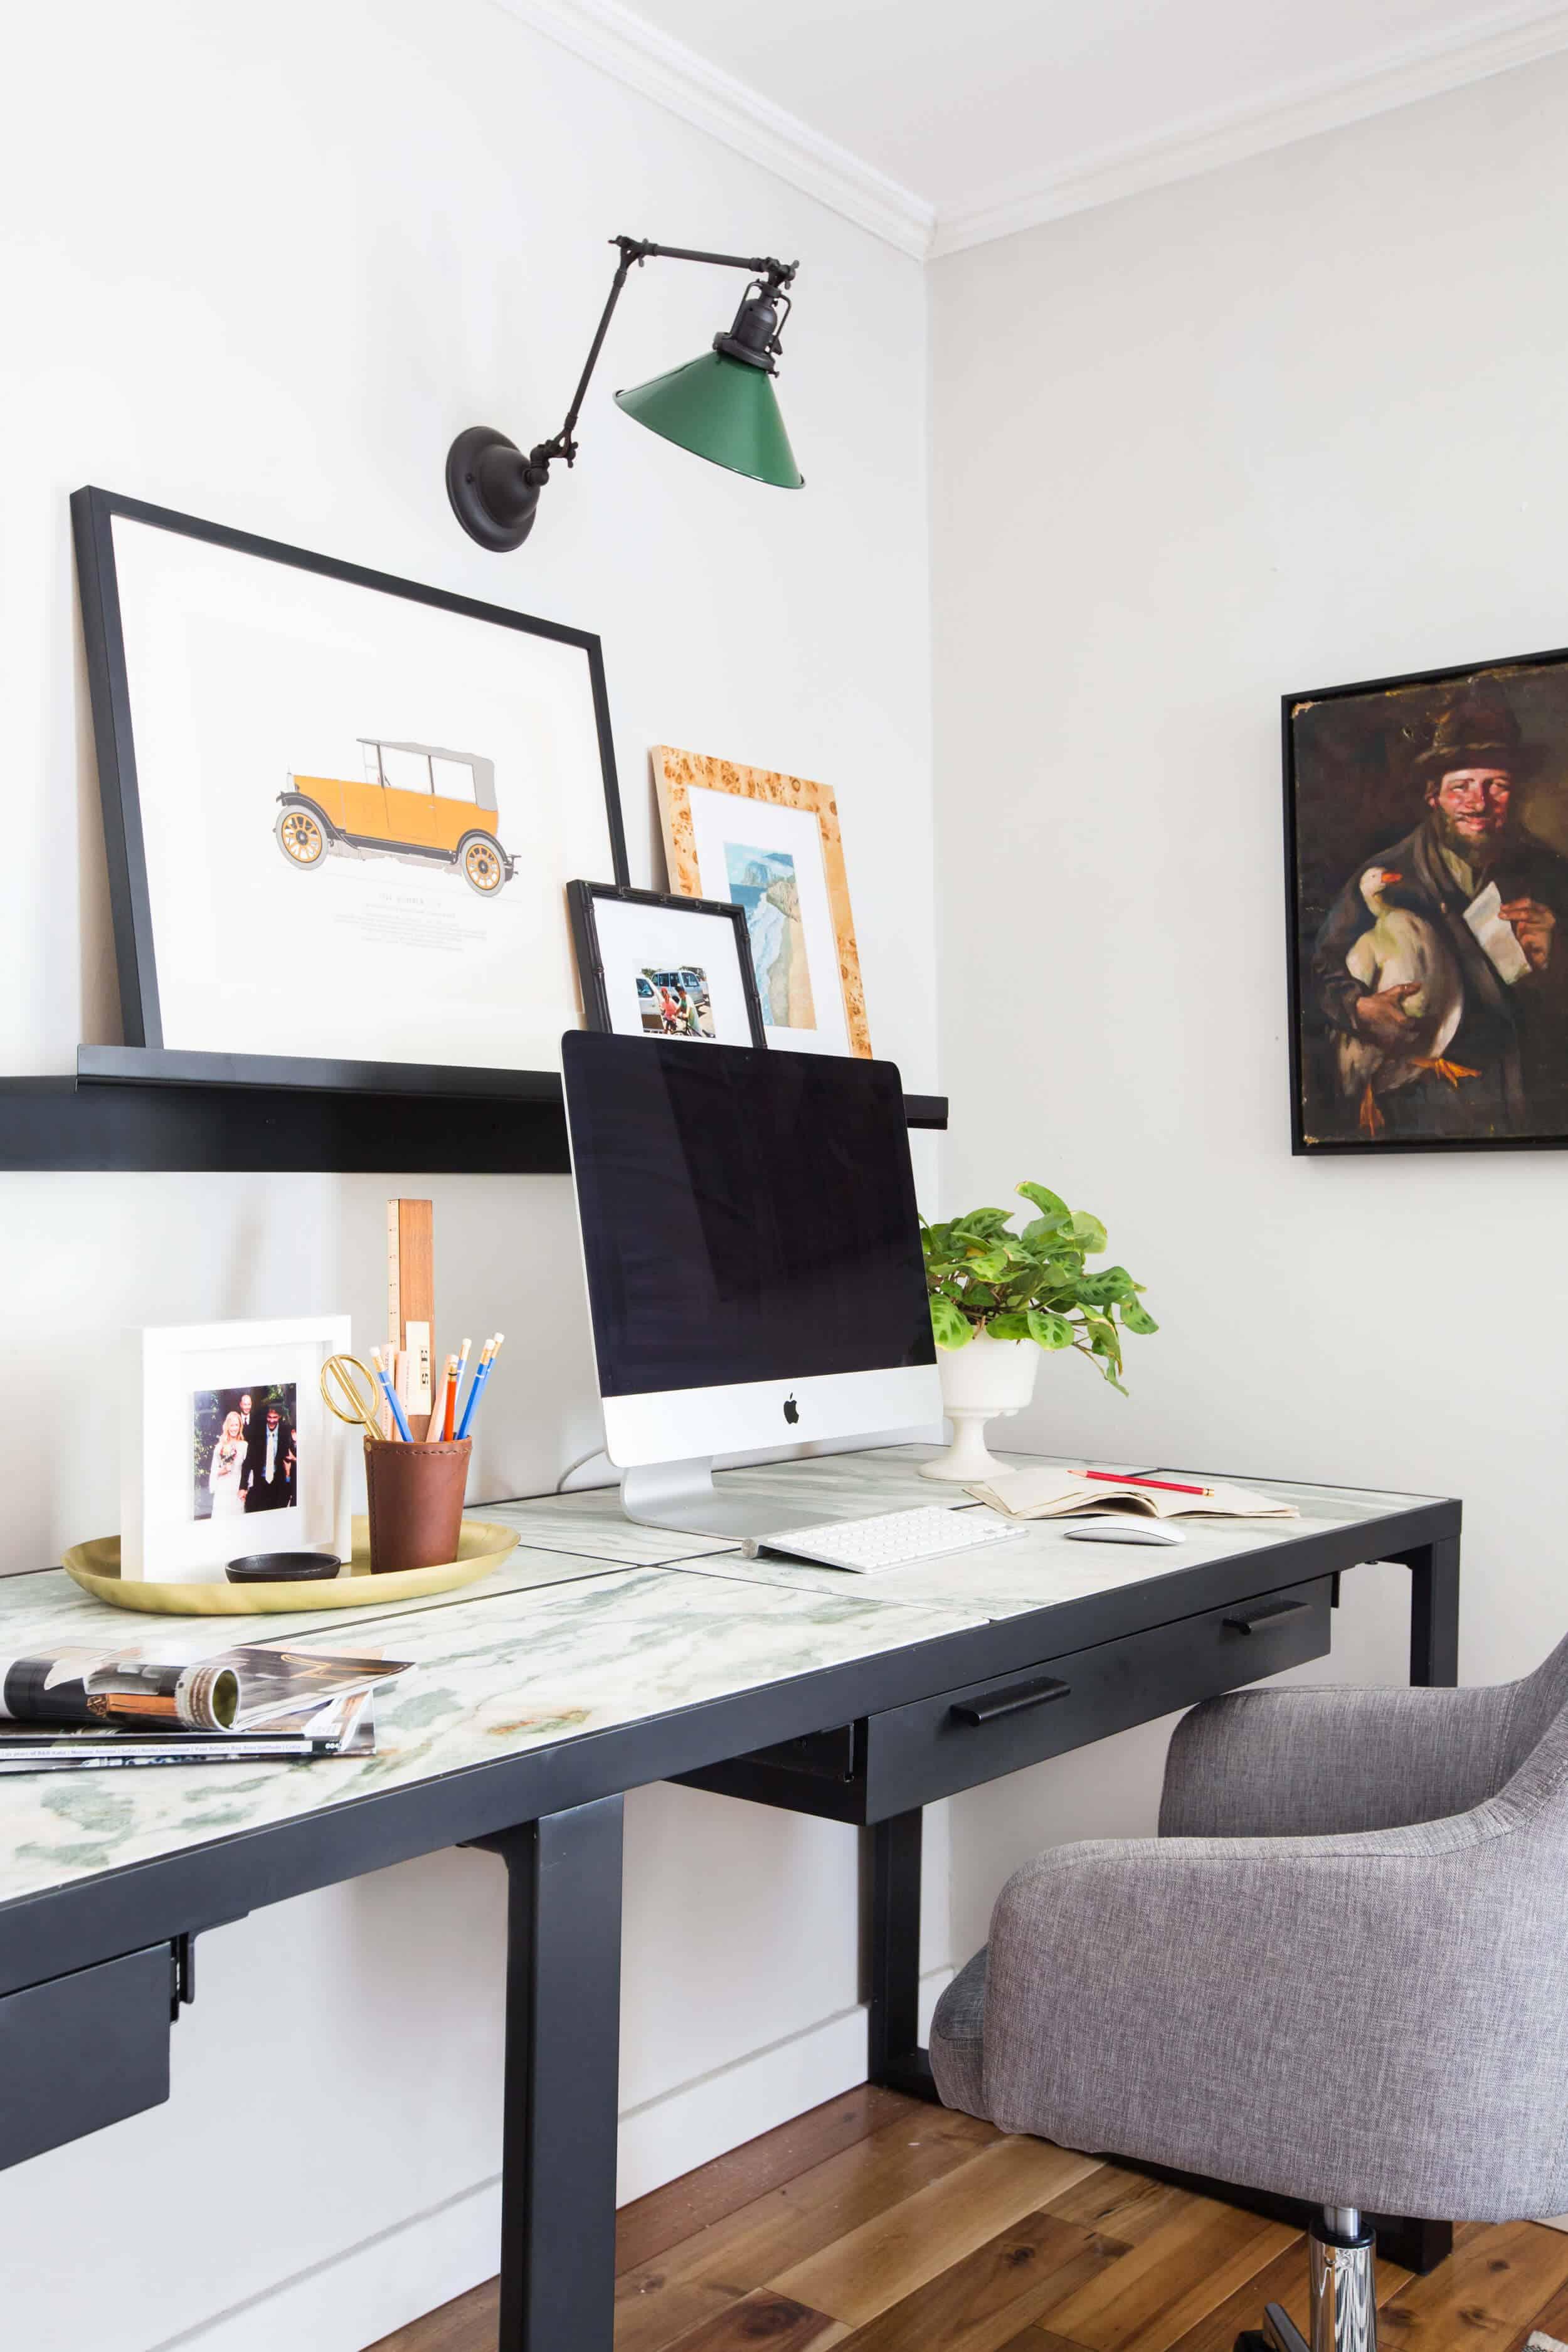 emily-henderson_framebridge_art-ledge_brians-office_masculine-office_guy_green_plaid-rug_workspace_modern_eclectic_6